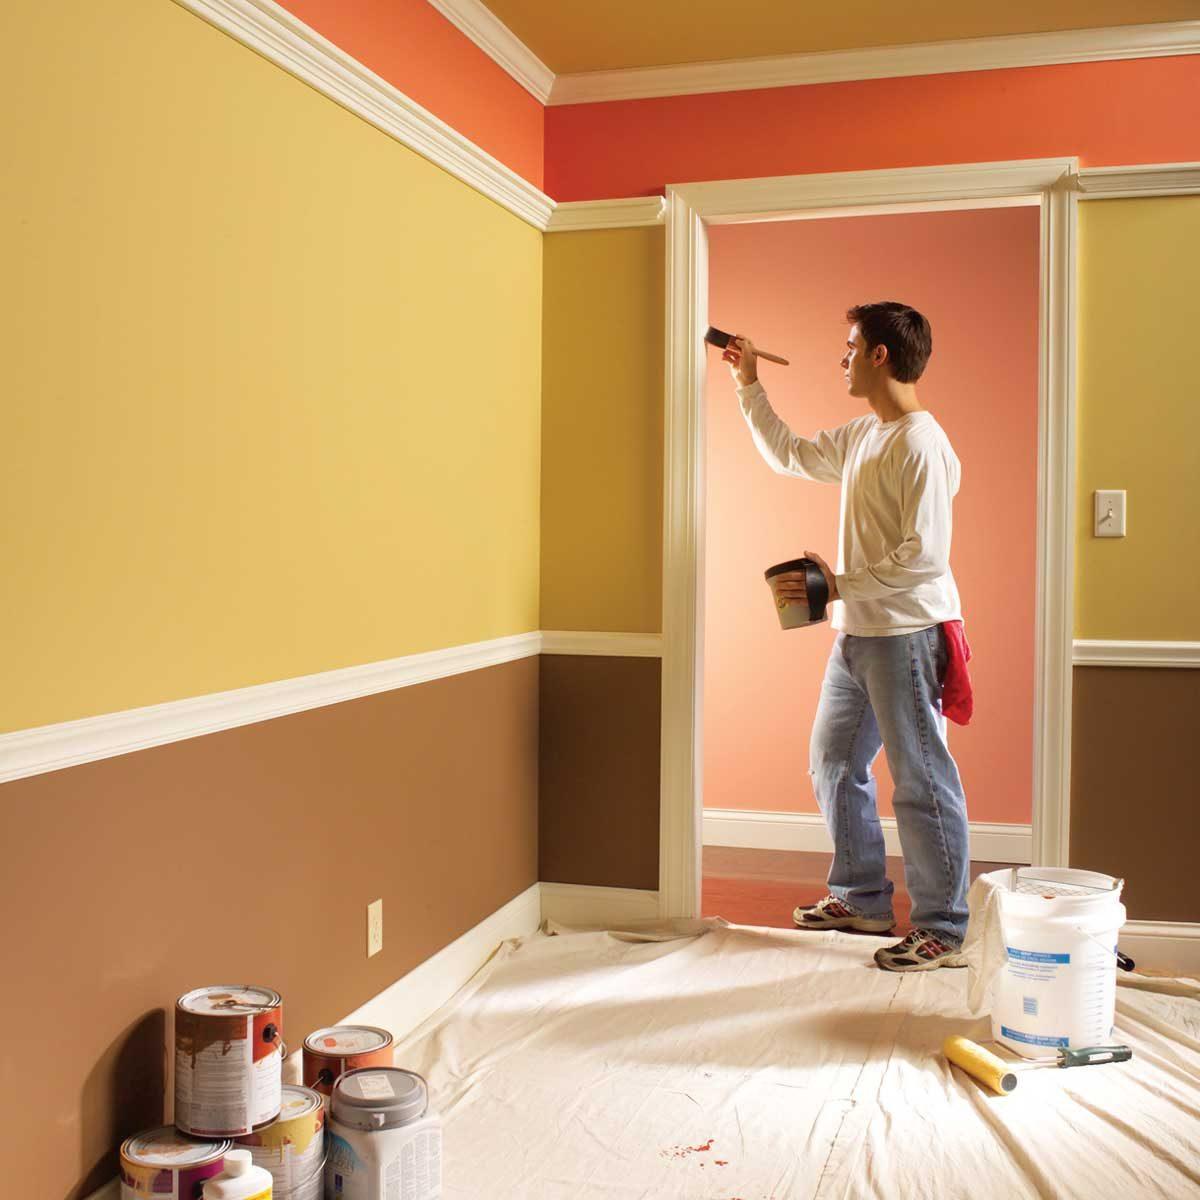 man painting a door frame